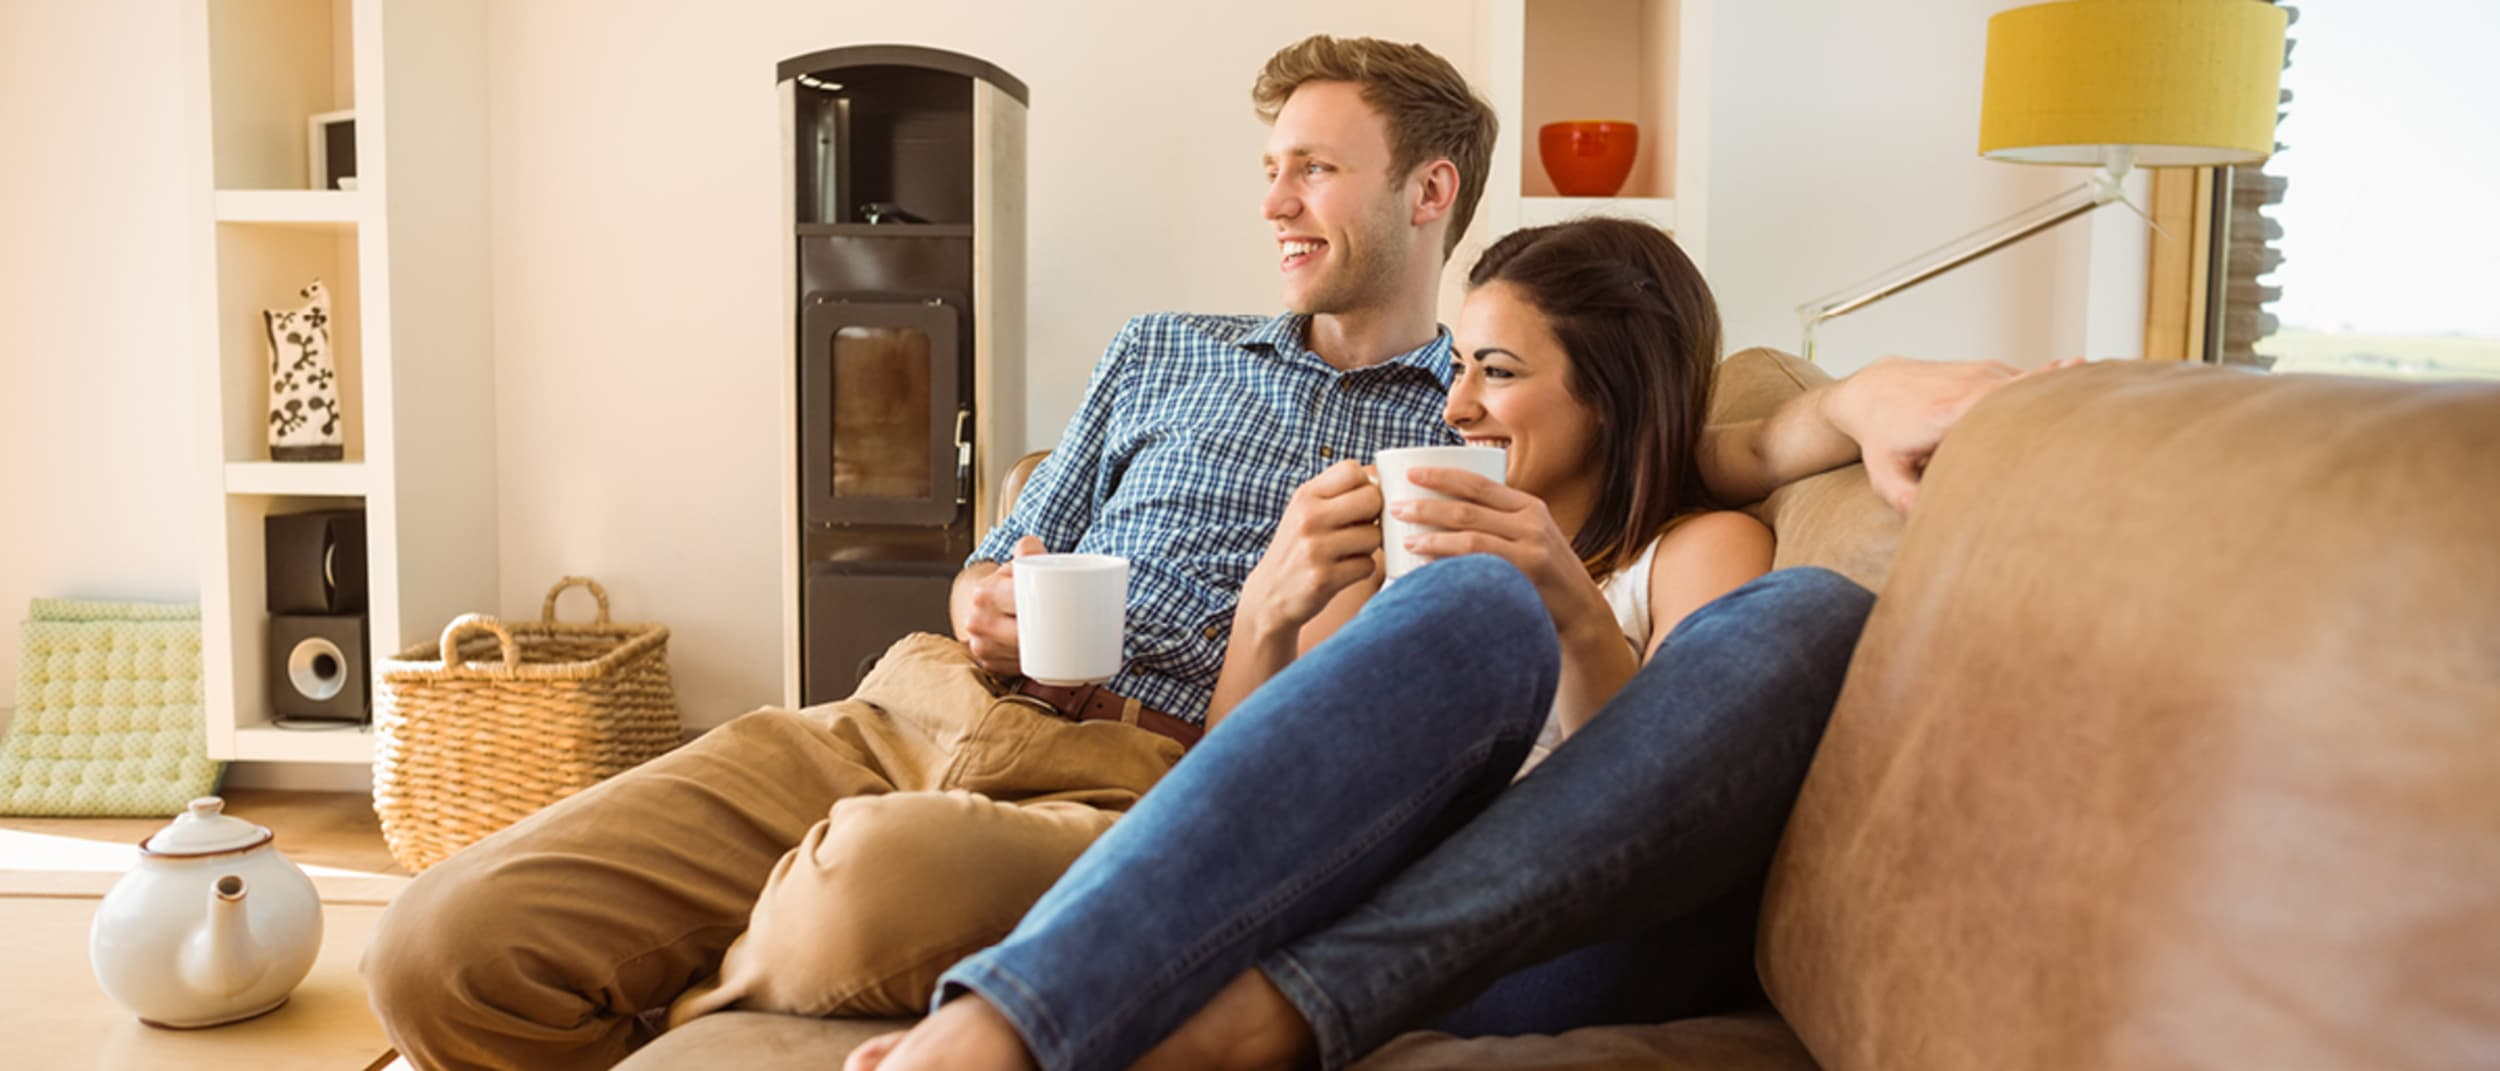 Aussie Home Loans at Westfield Chermside